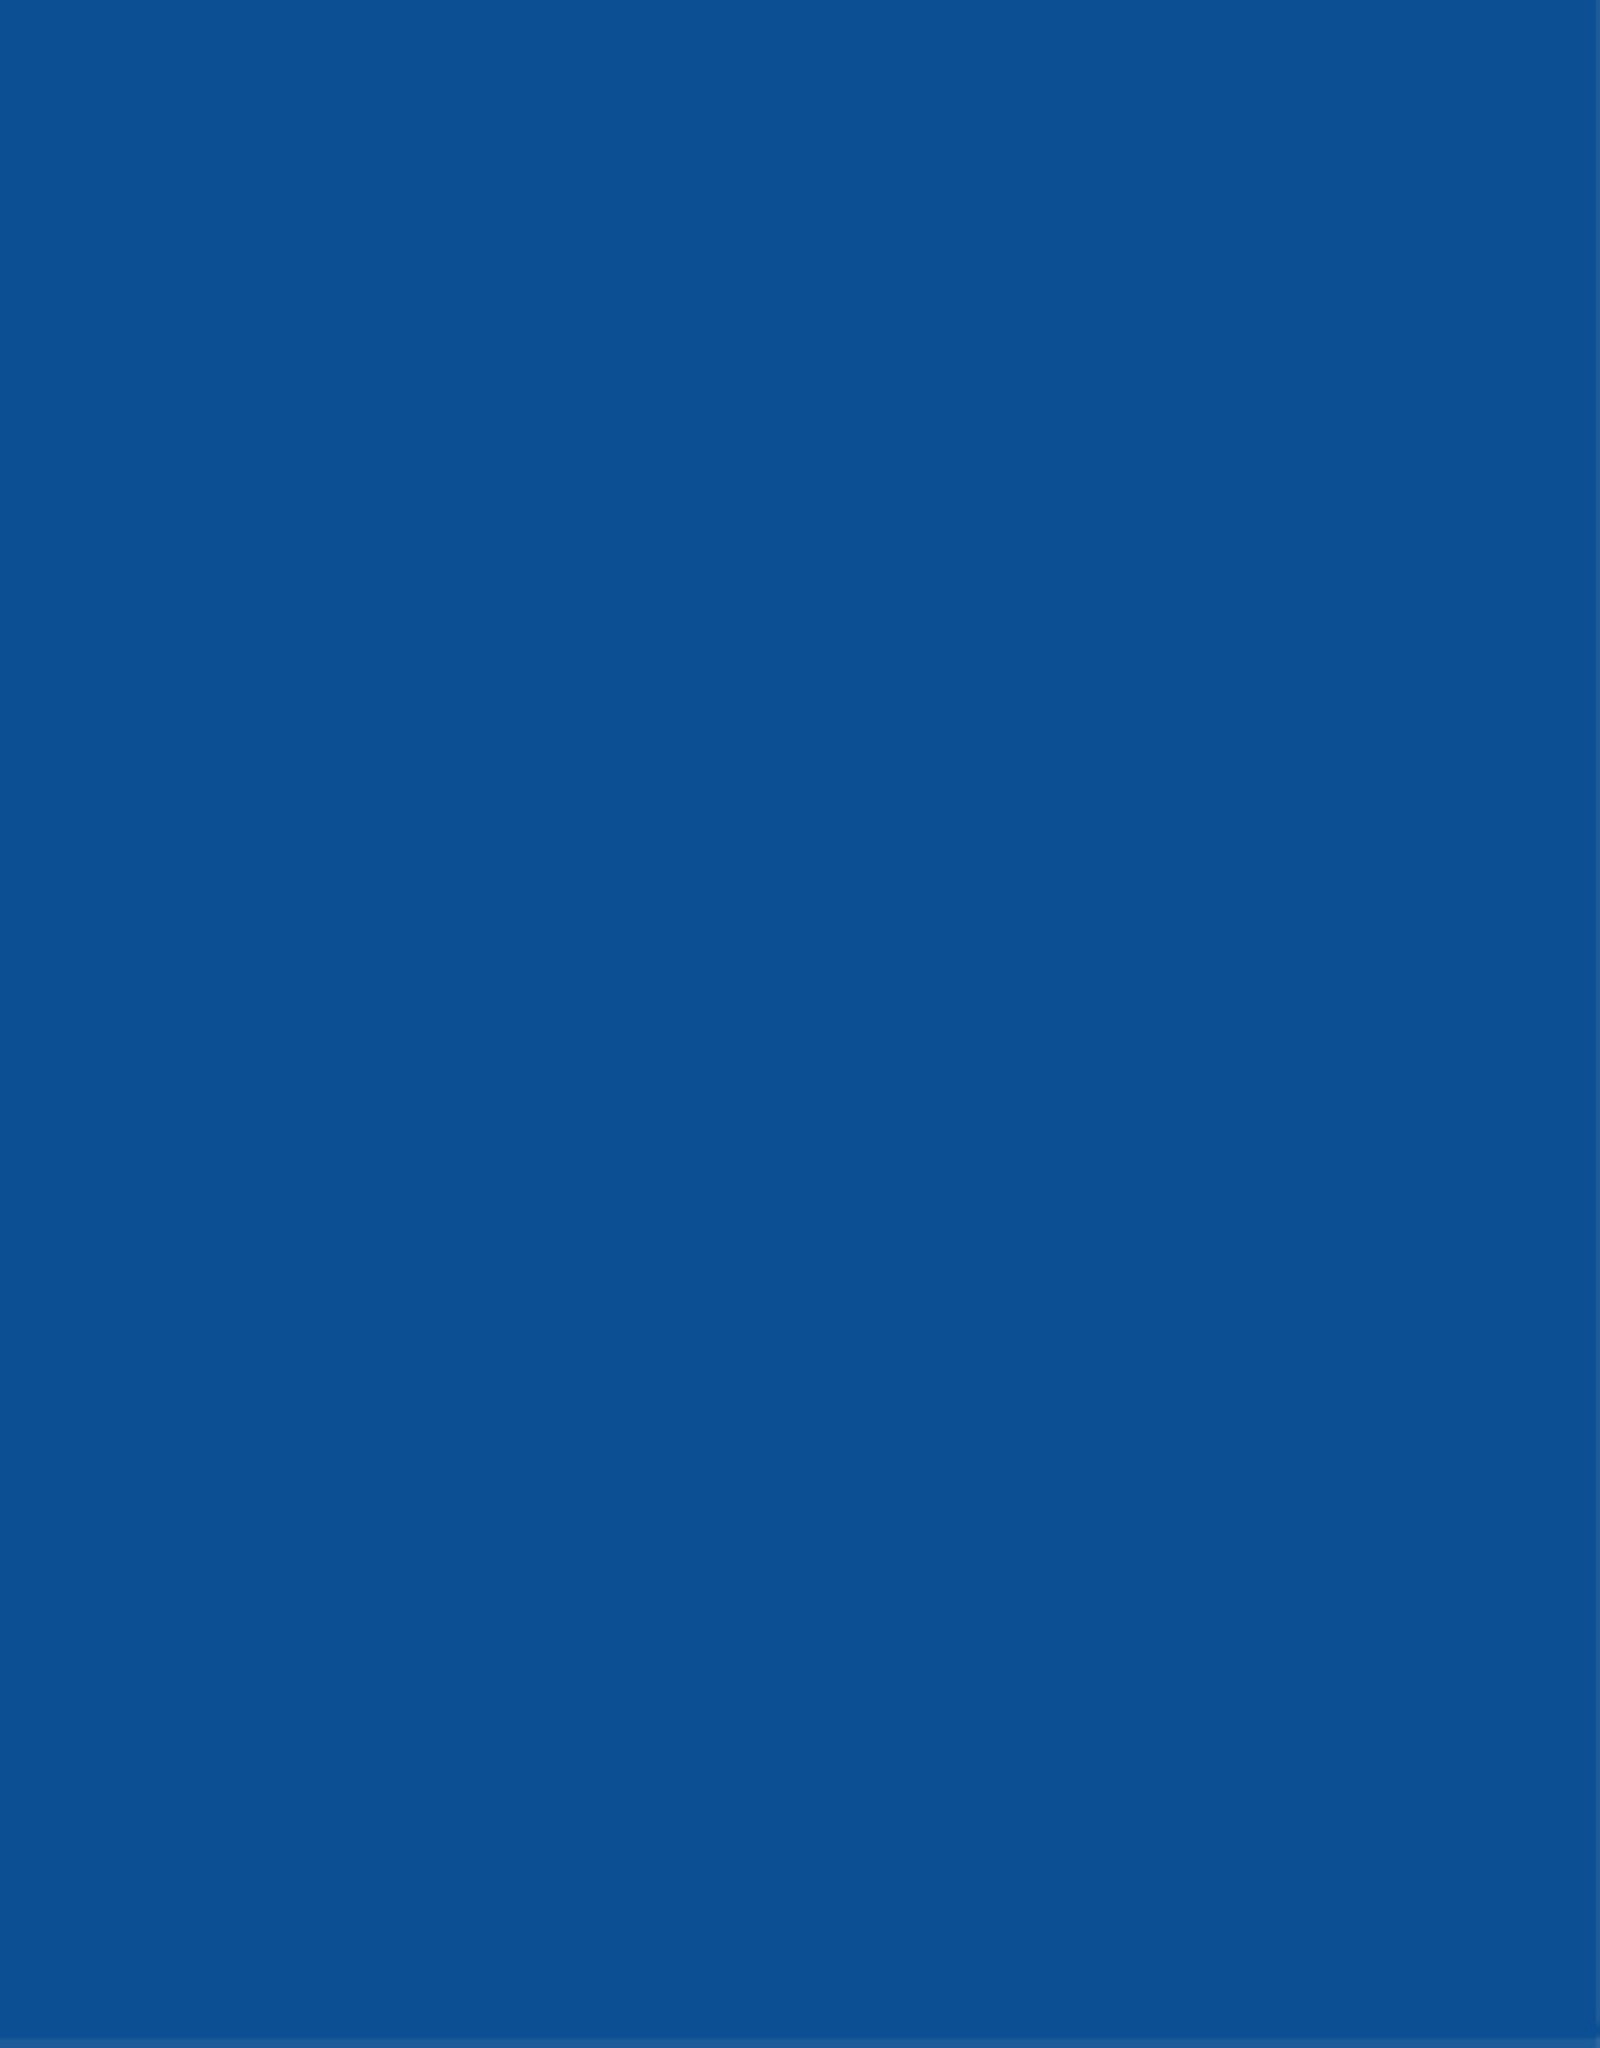 Jacquard iDye Brilliant Blue